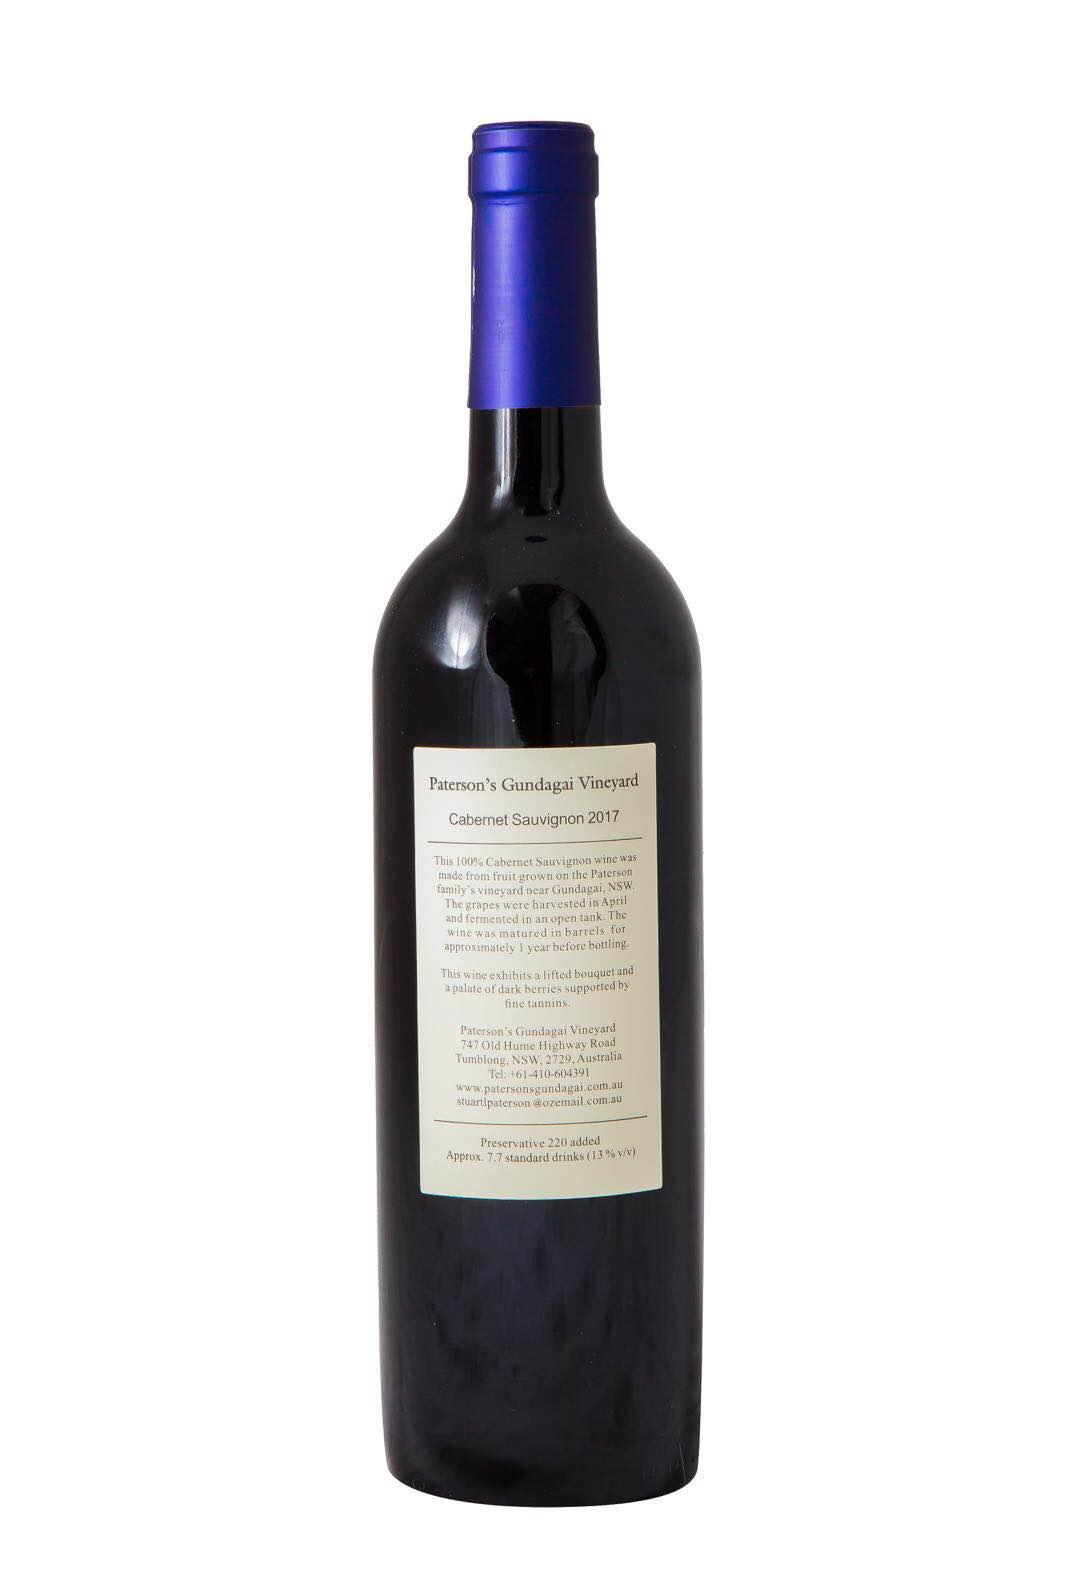 2017 Paterson's Gundagai Vineyard Cabernet Sauvignon